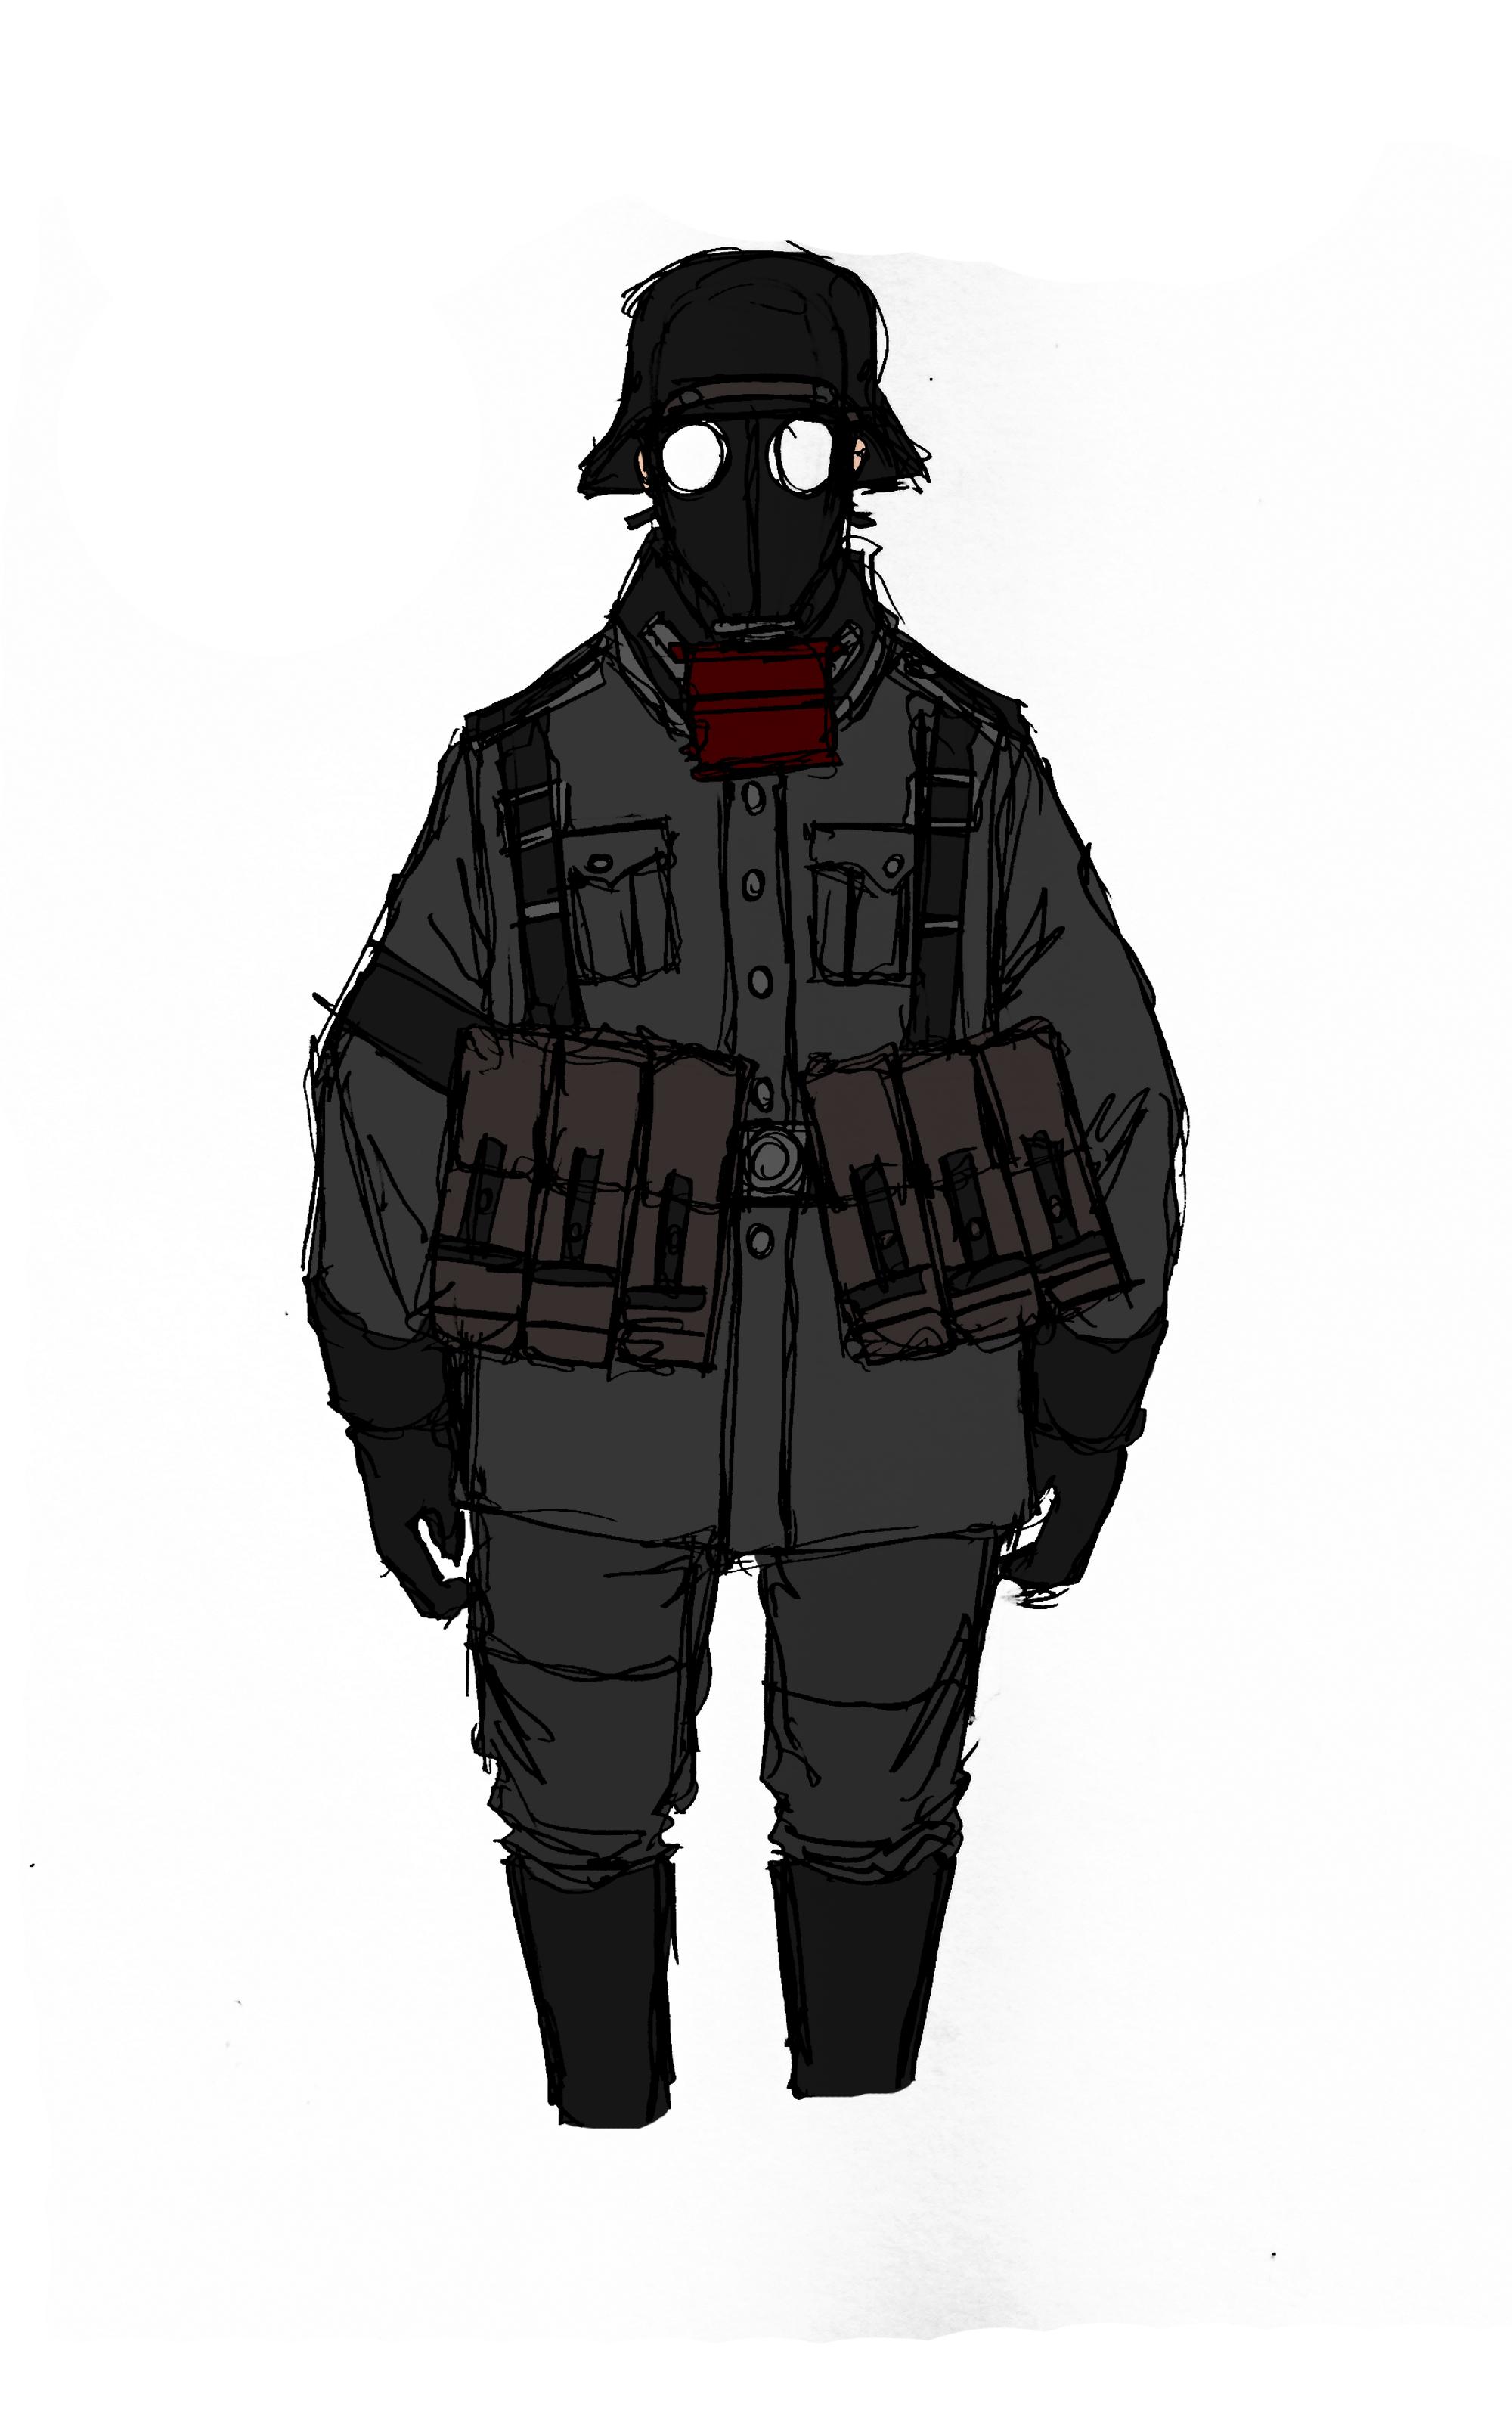 Welkin Trooper by NicklausofKrieg